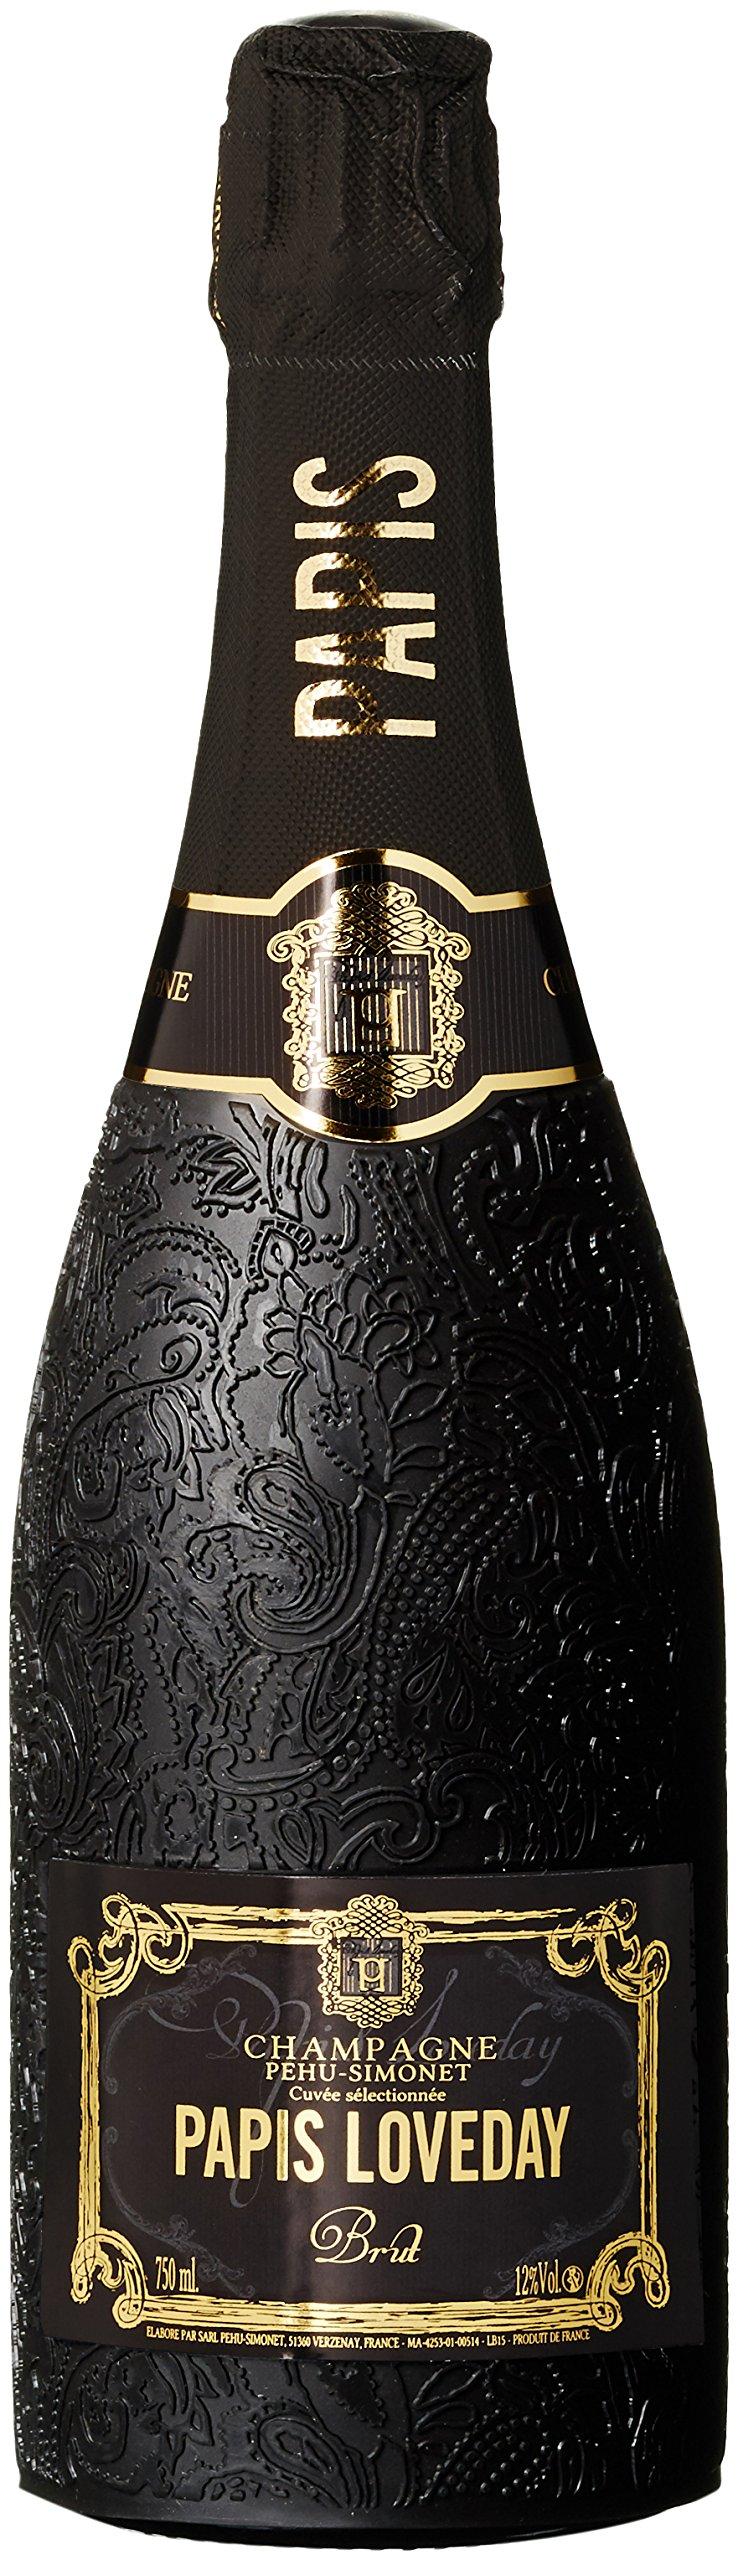 Papis-Loveday-Champagne-Brut-Champagner-1-x-075-l